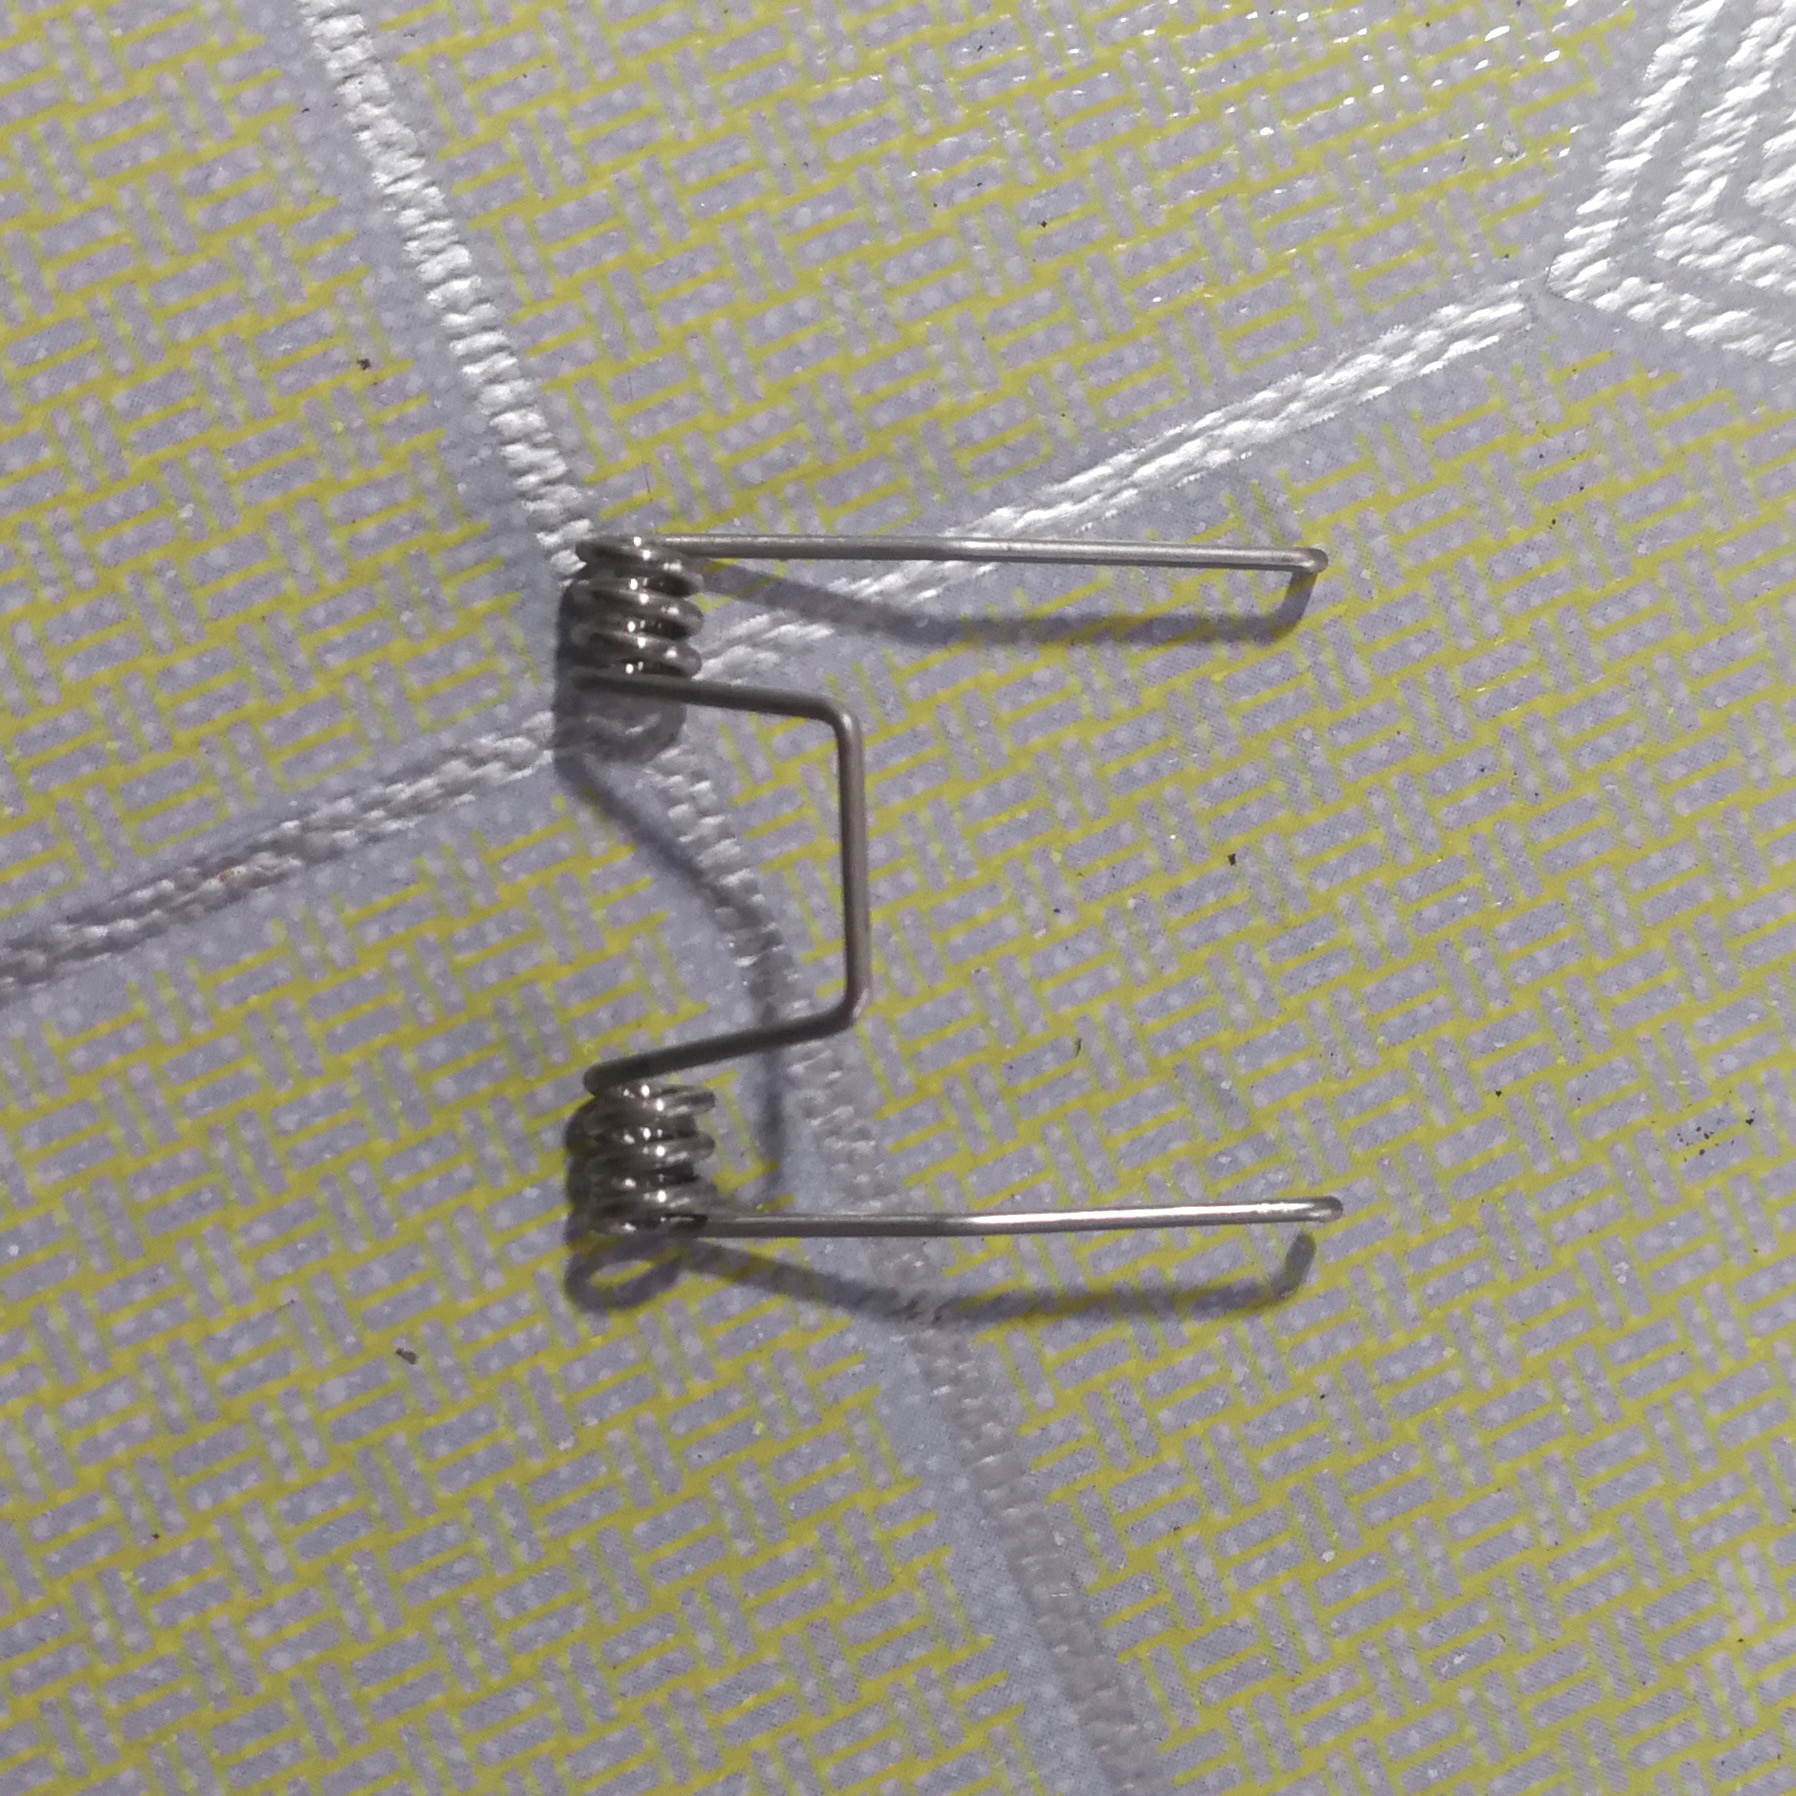 Sirreepet cortadora de pelo reemplazo resorte Moser 5 en 1 hoja